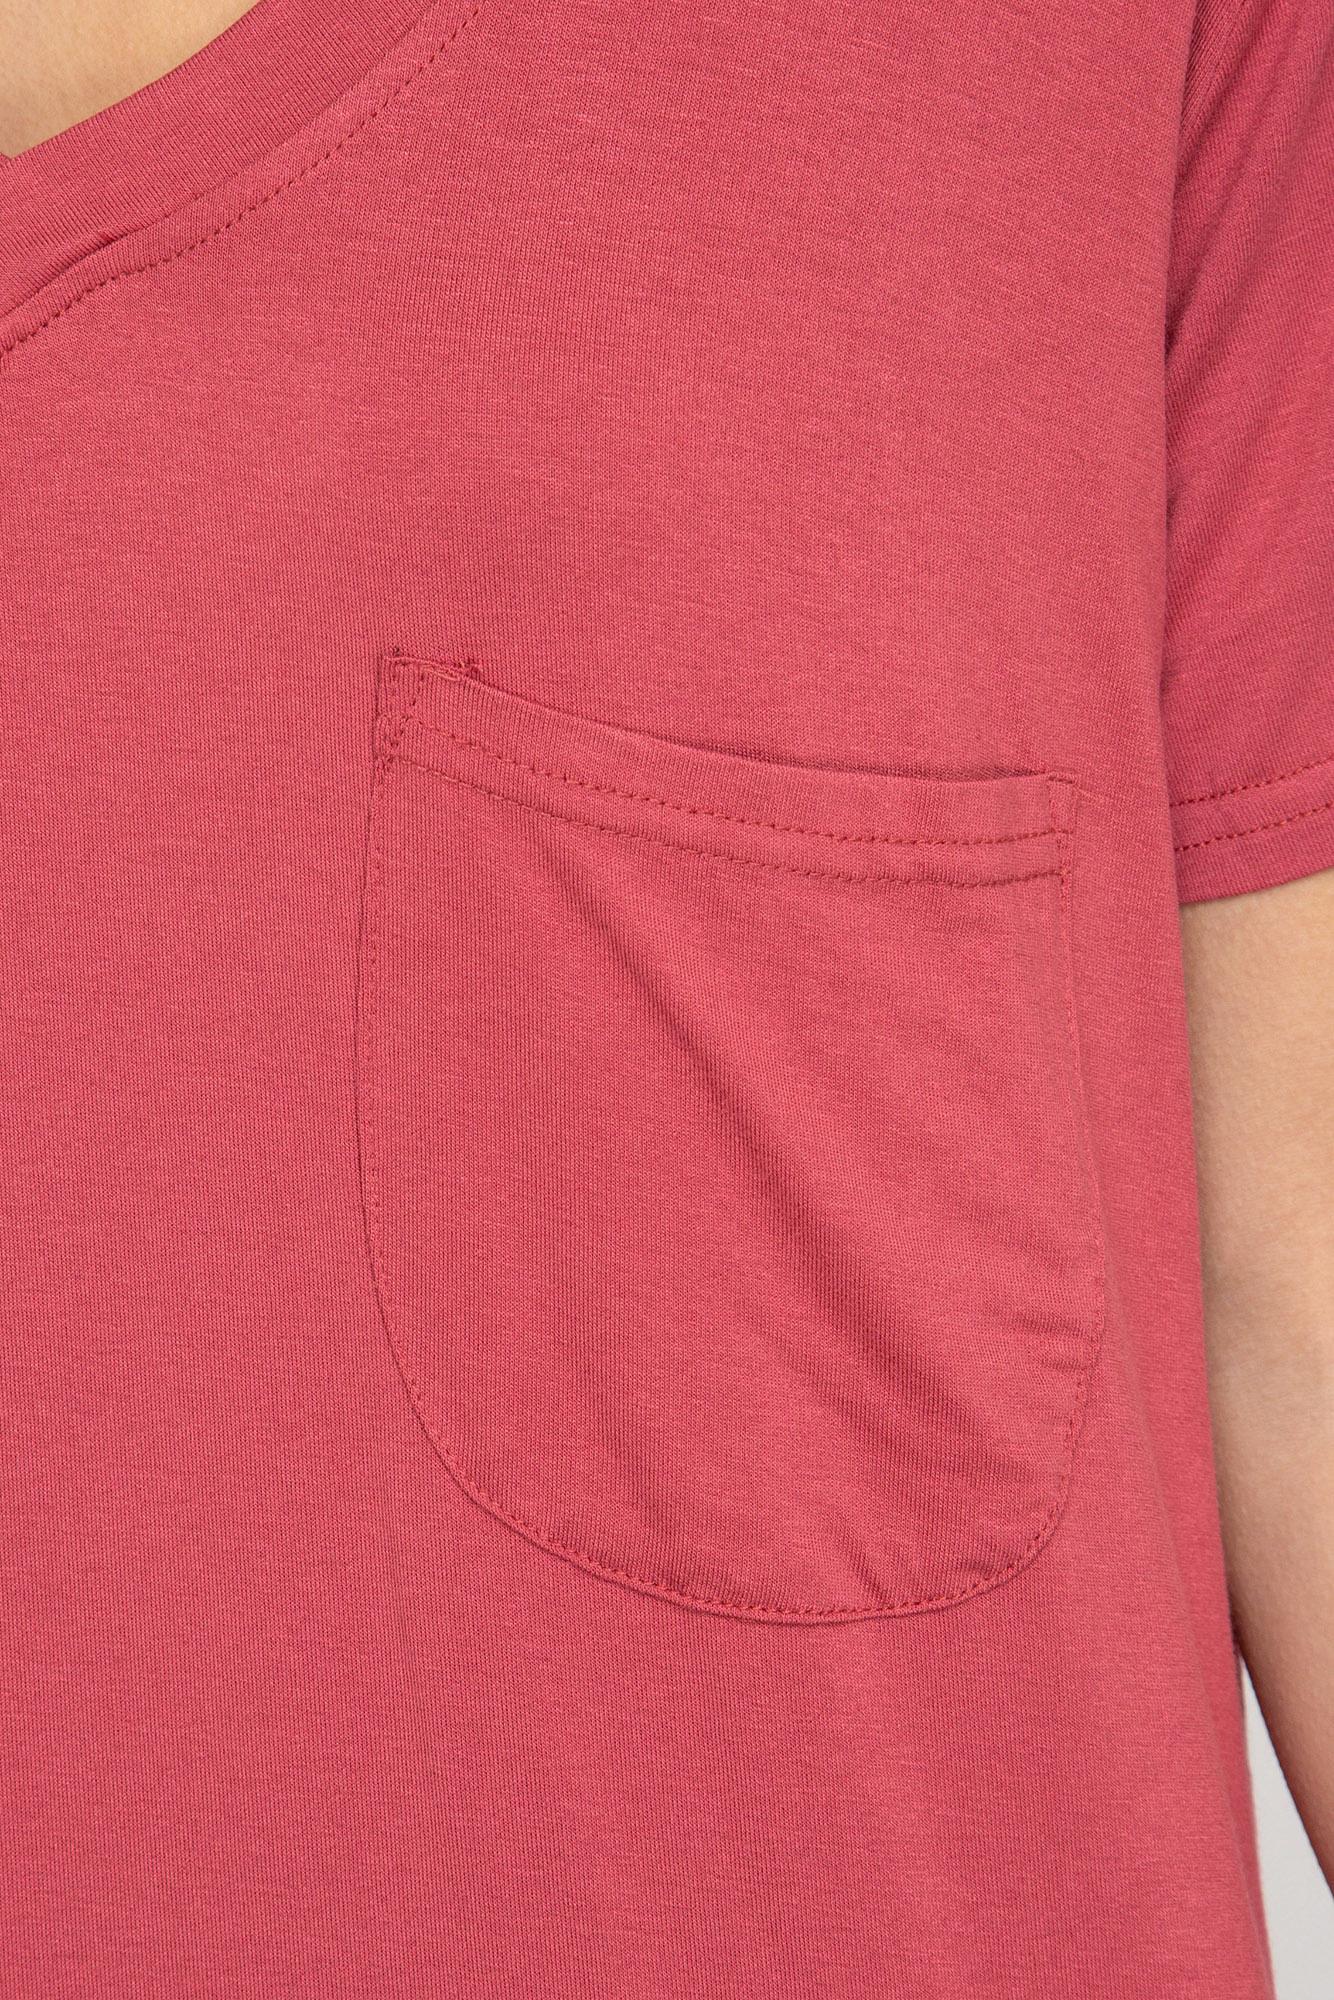 SS V neck pocket front tee